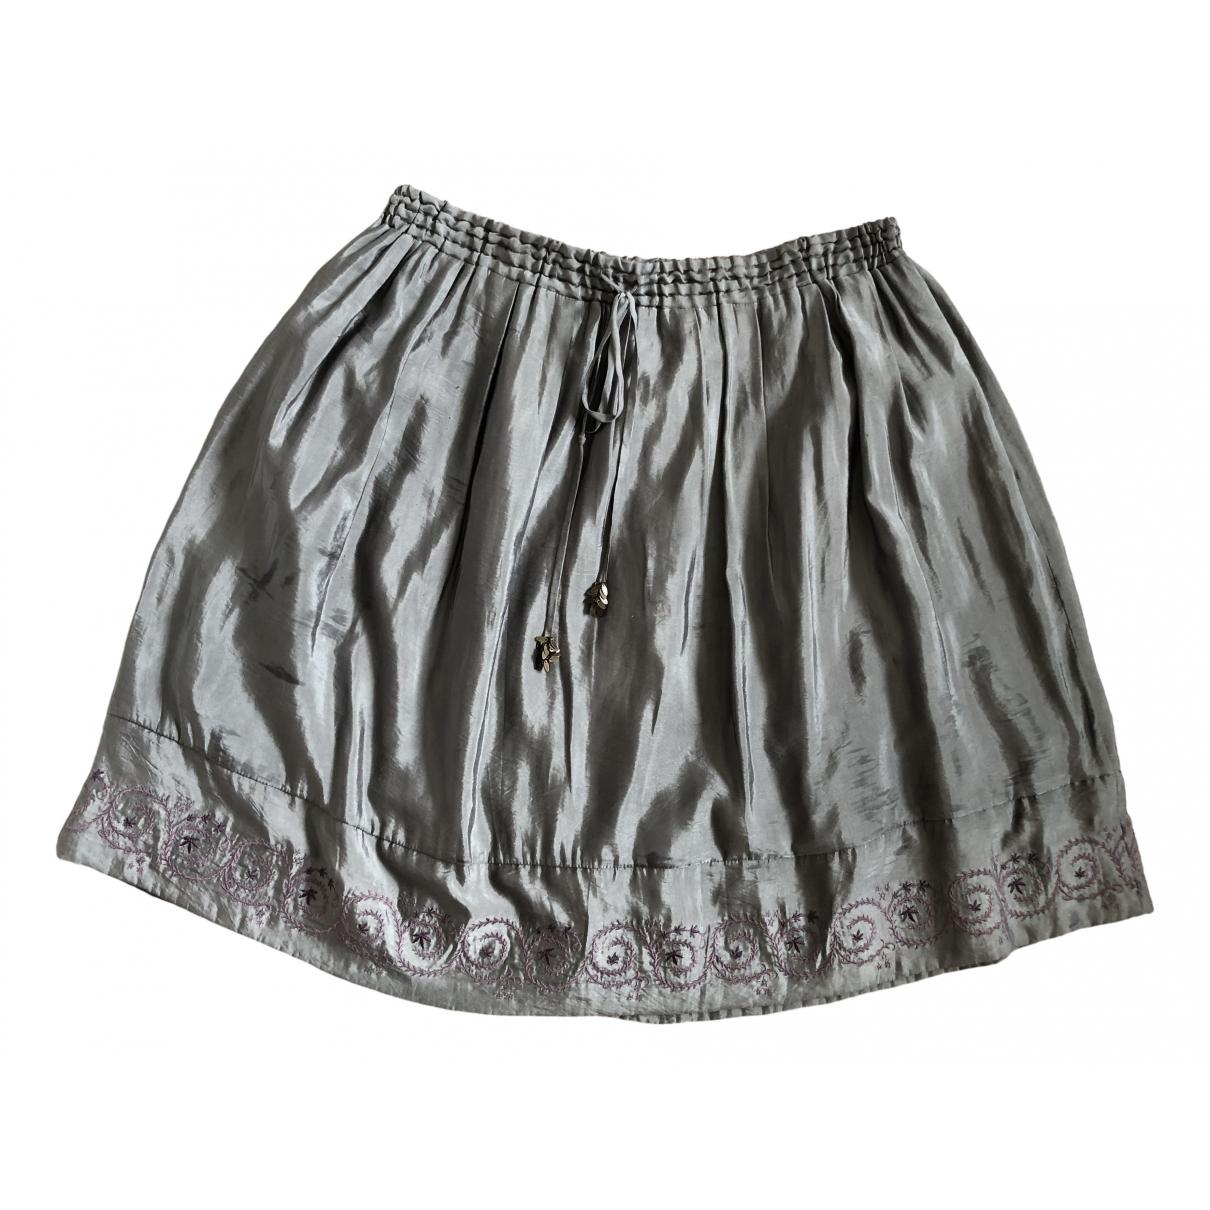 Zadig & Voltaire \N Grey skirt for Women 36 FR